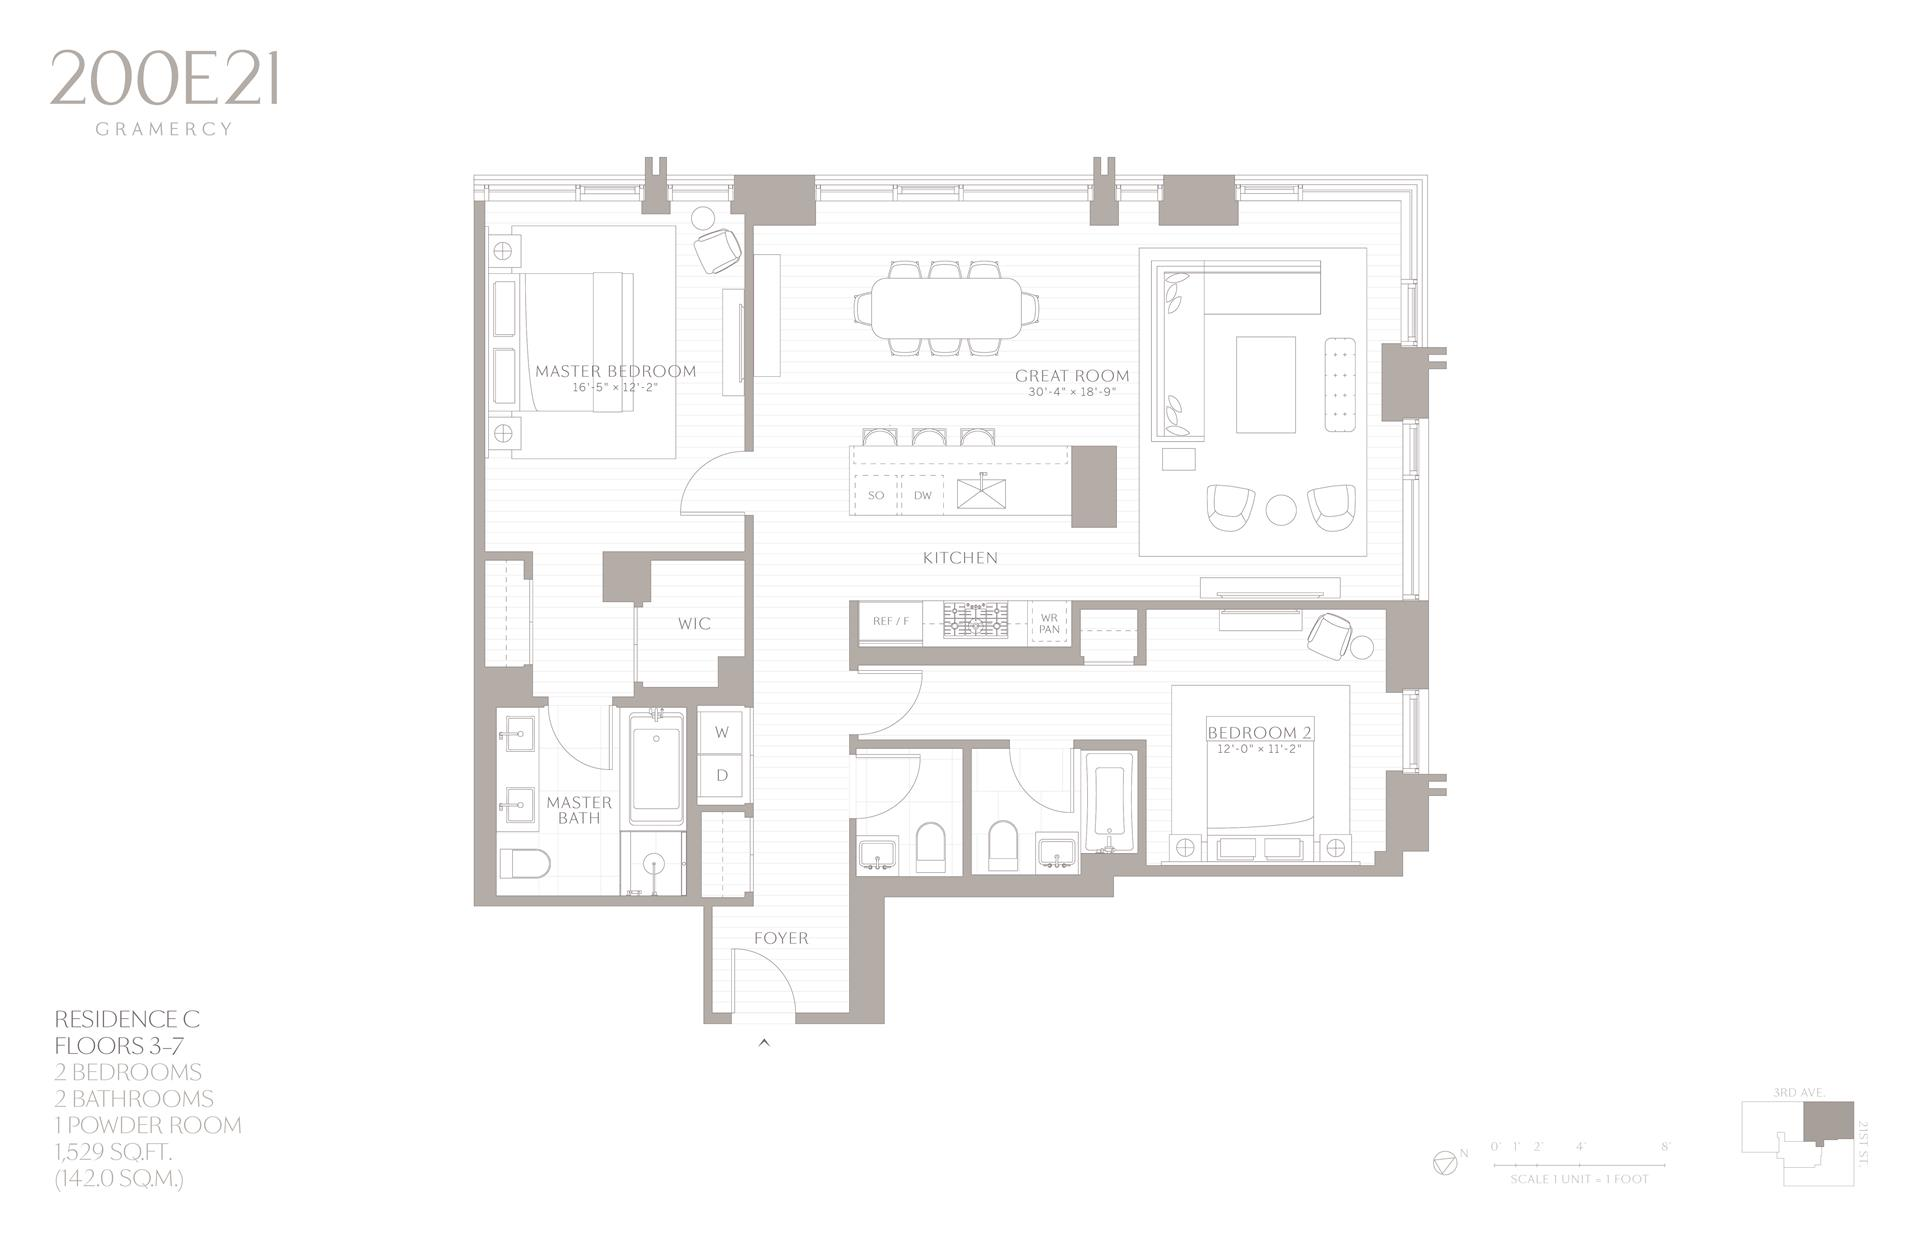 Floor plan of 200 East 21st Street, 7C - Gramercy - Union Square, New York